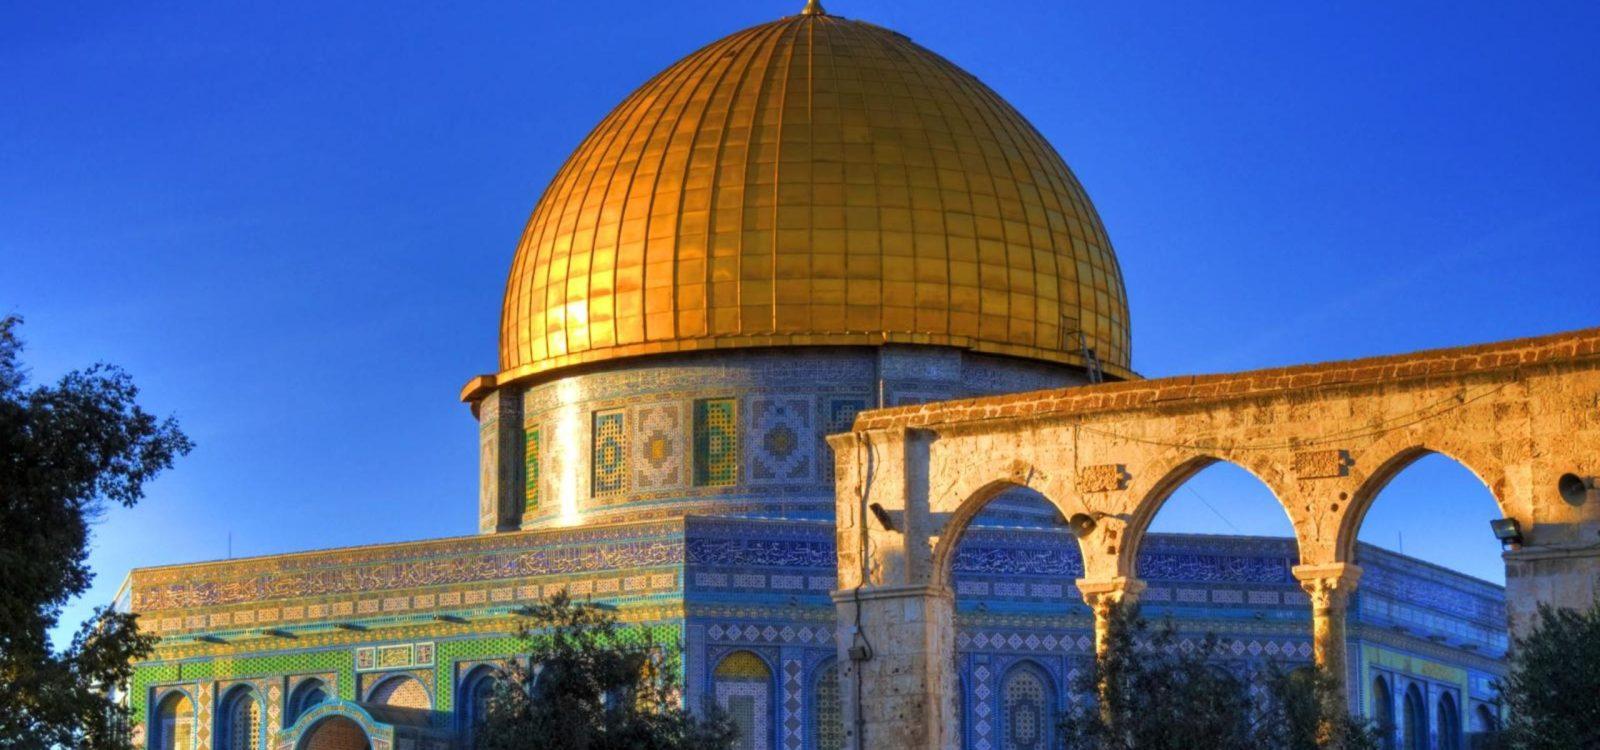 Pompes funèbres musulmanes – KITAB WA SUNNA